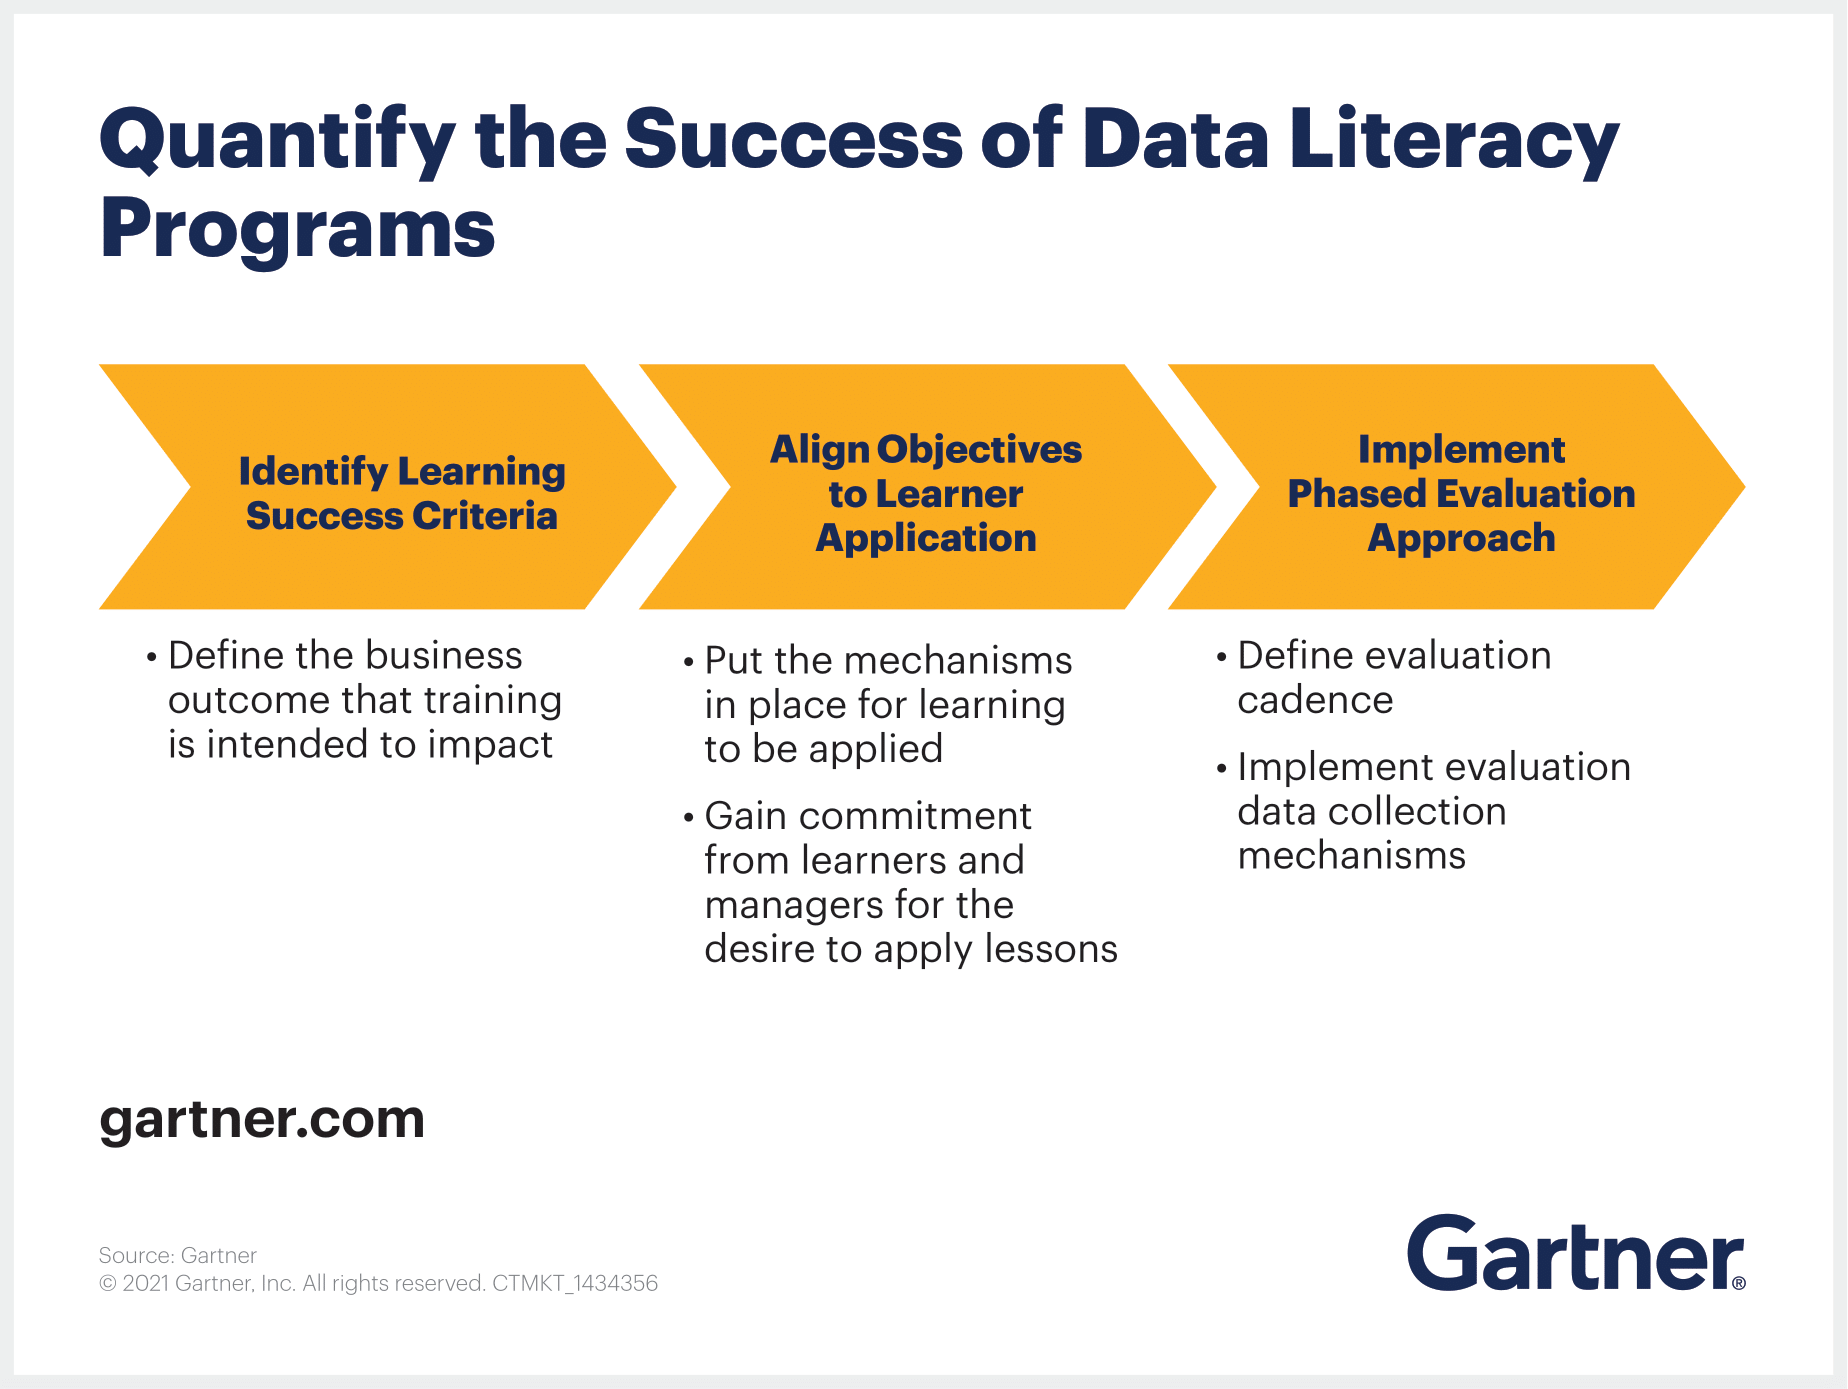 Quantify the success of data literacy programs